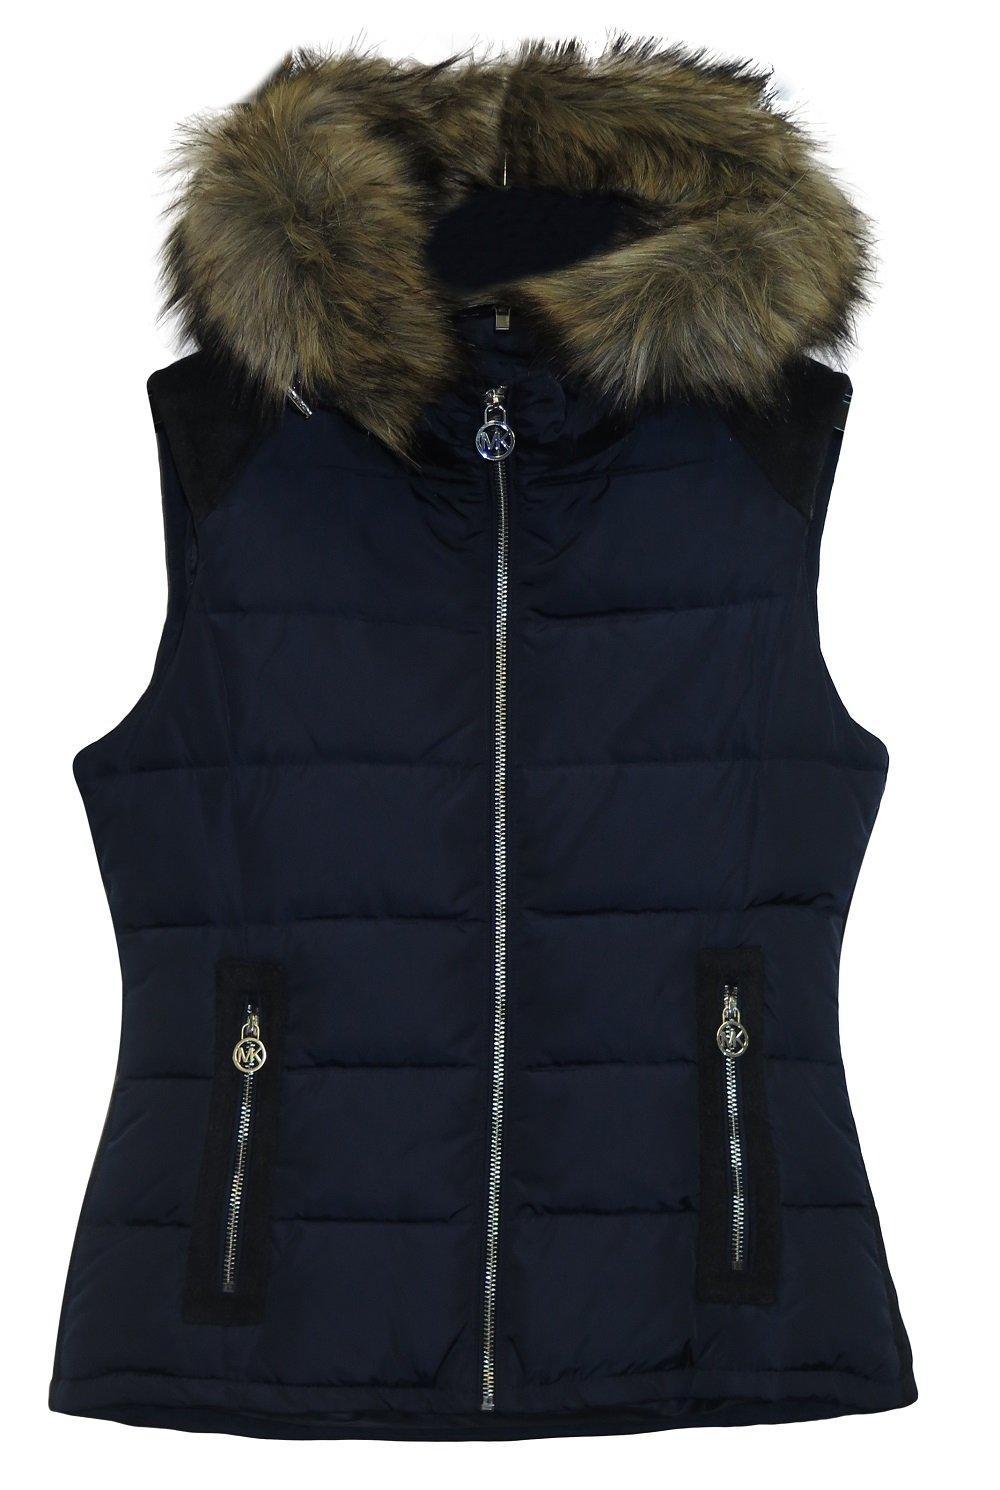 Michael Michael Kors Navy Puffer Vest (L)